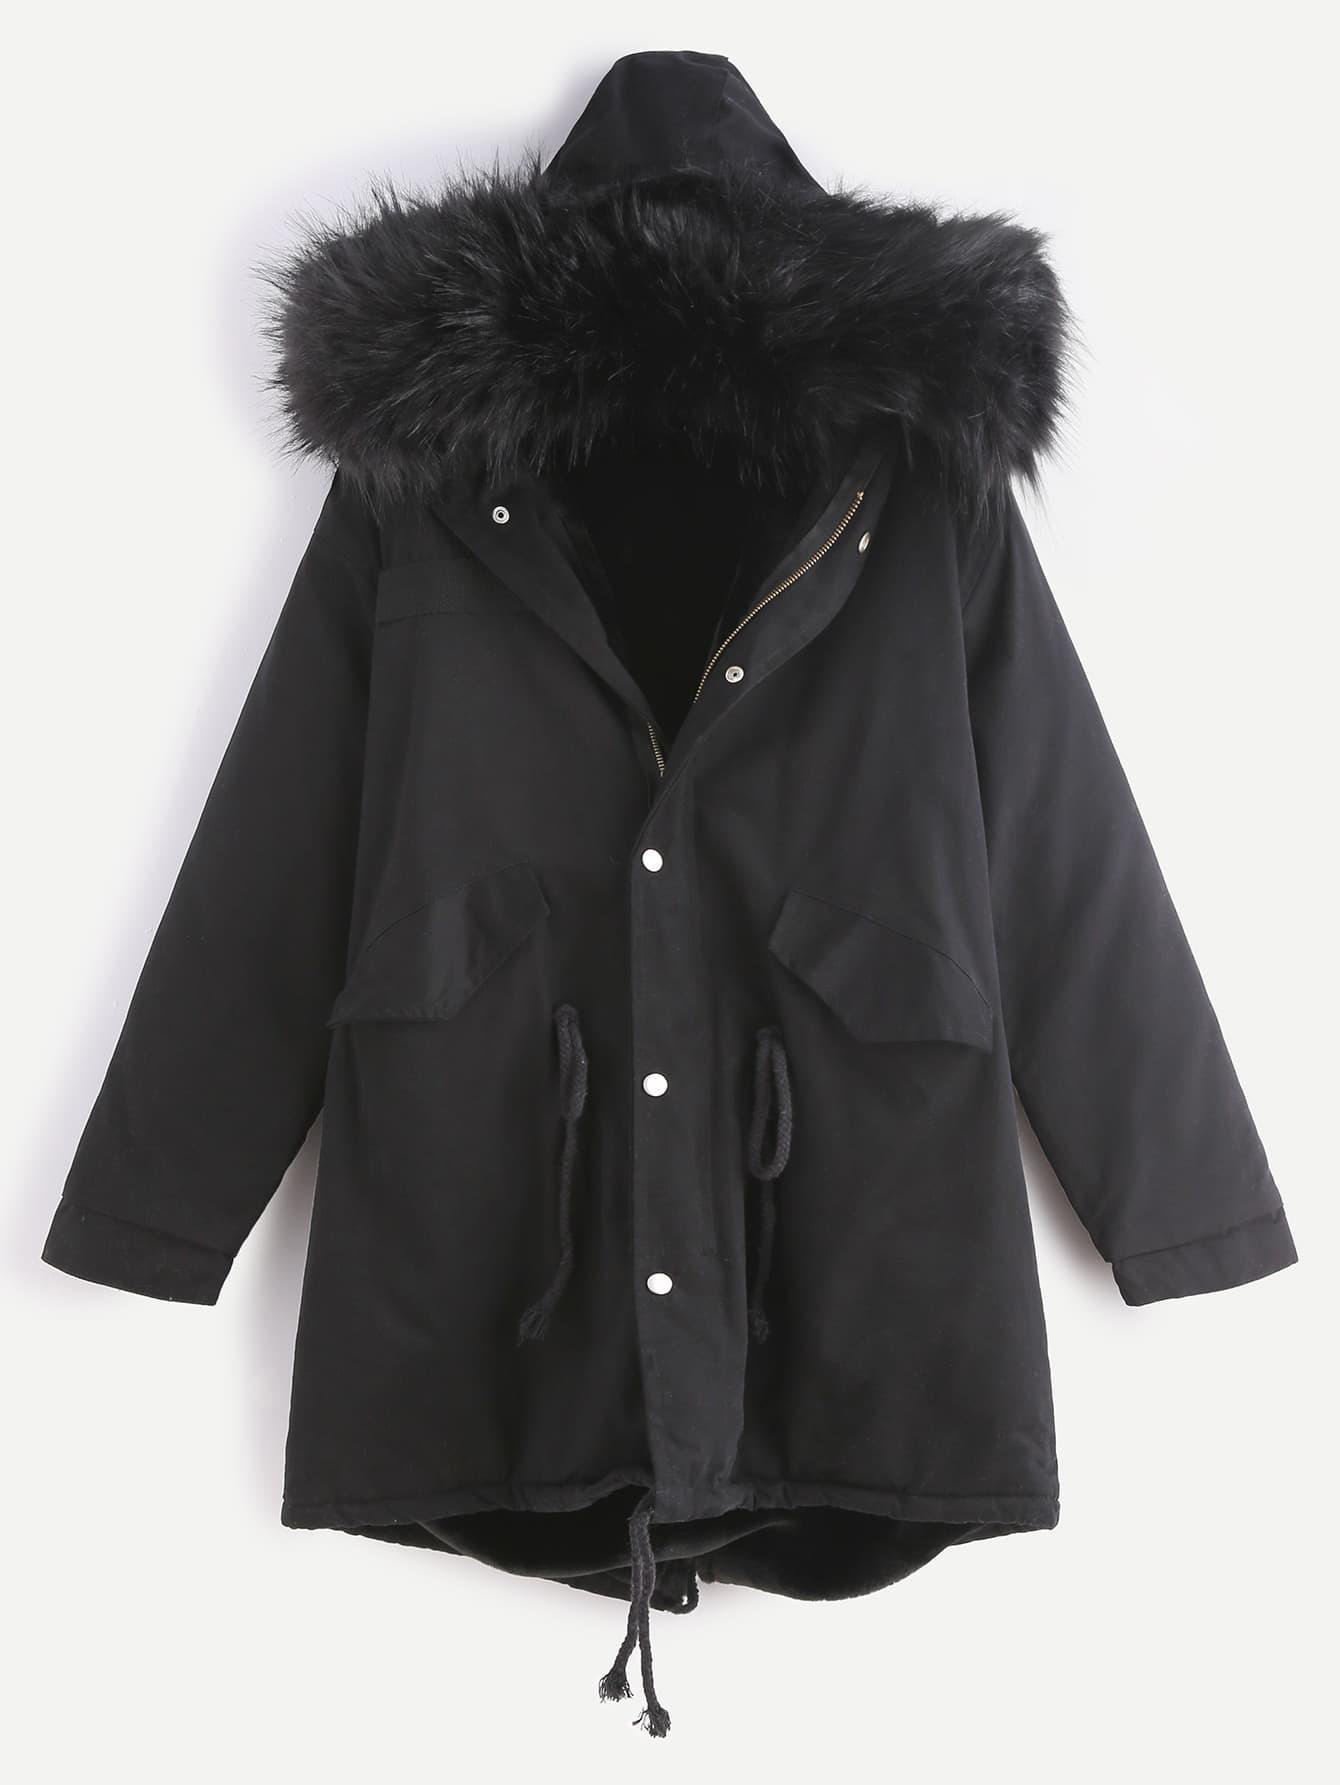 Black Drawstring Hooded Fleece Lined Faux Fur Trim Parka faux fur lined parka coat